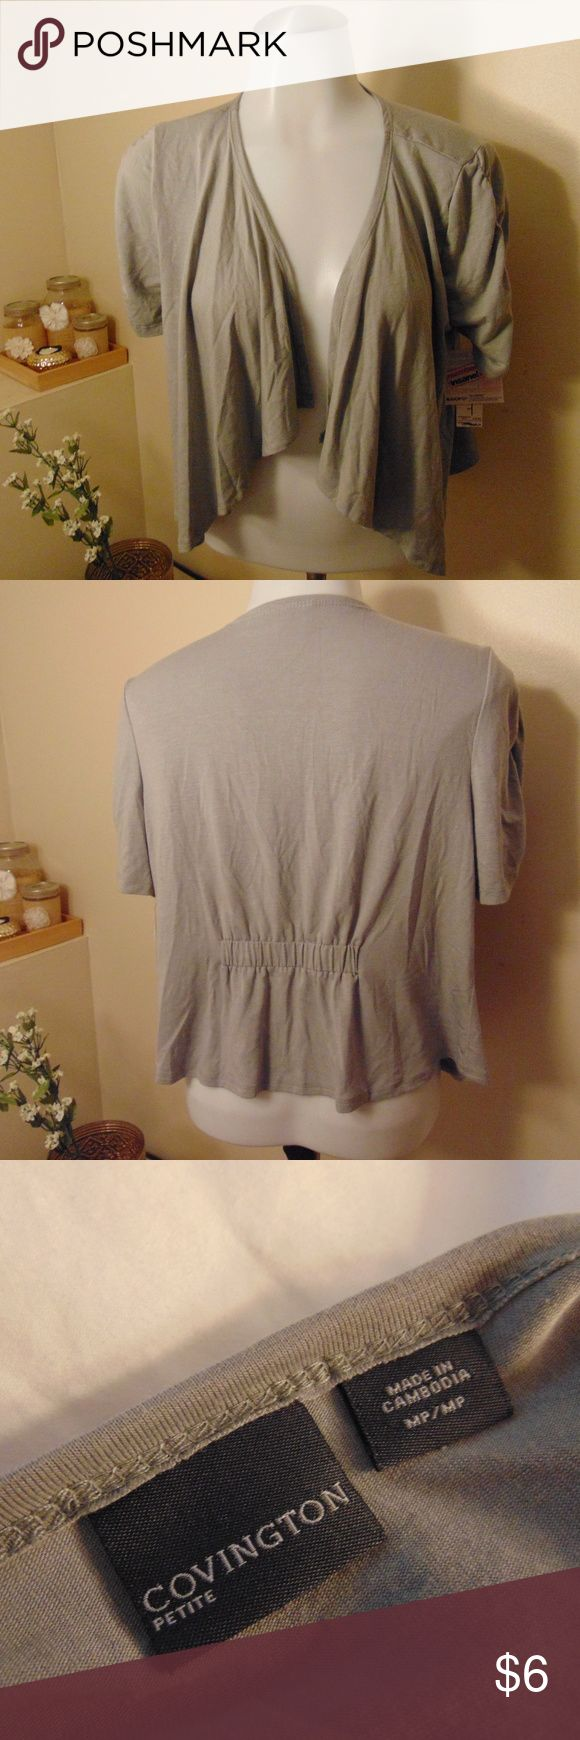 *NWT!* Covington Petite Cardigan NWT! Medium Petite Cardigan. 3/4 Sleeve Length. Covington Sweaters Cardigans